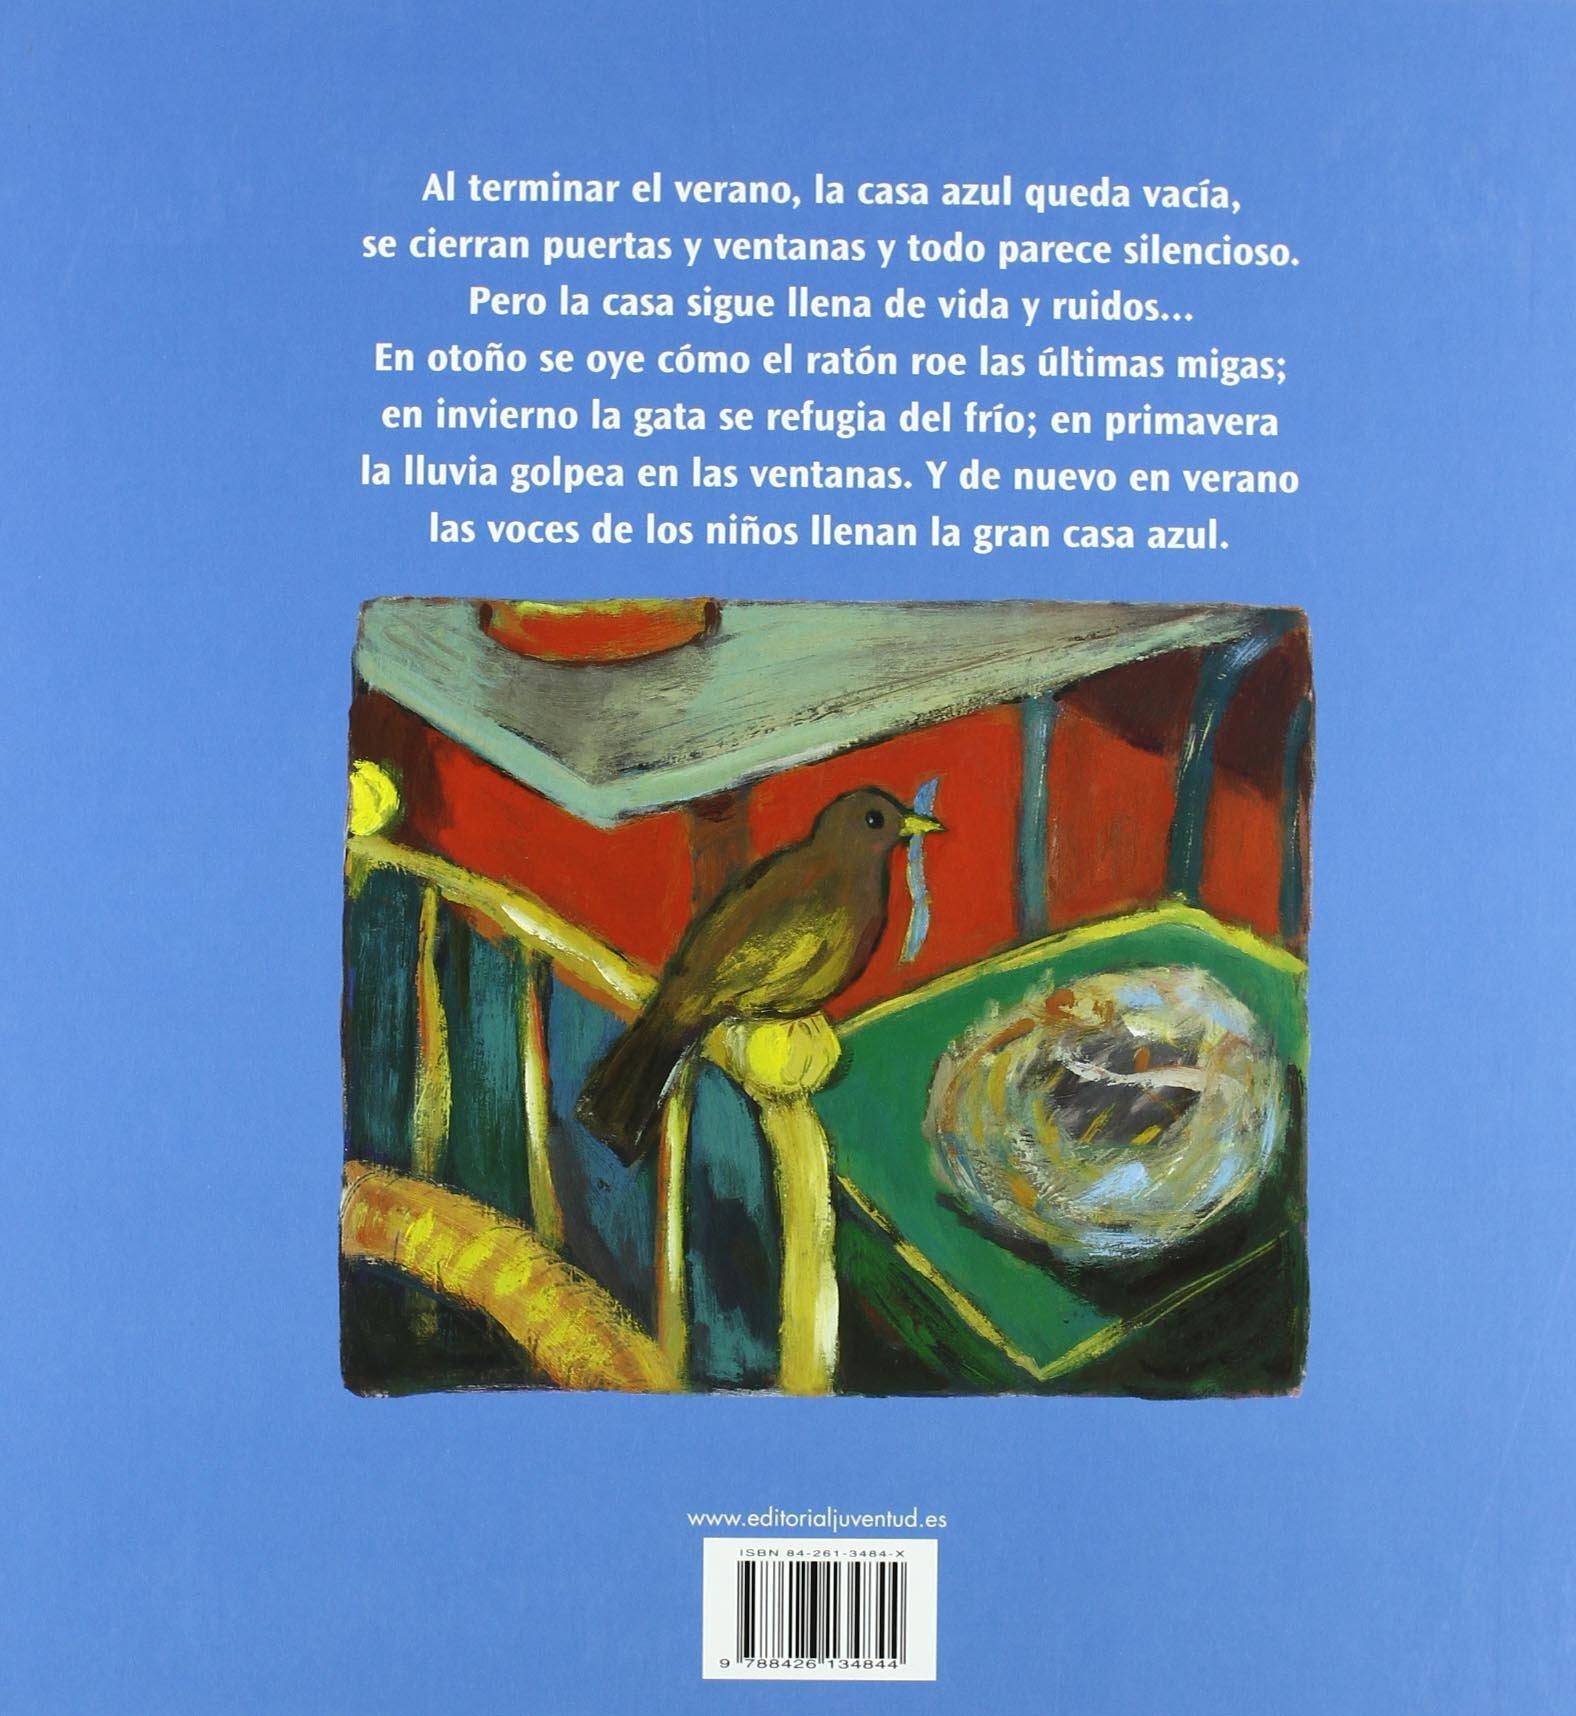 La Gran Casa Azul / The Great Blue House (Spanish Edition): Kate Banks: 9788426134844: Amazon.com: Books